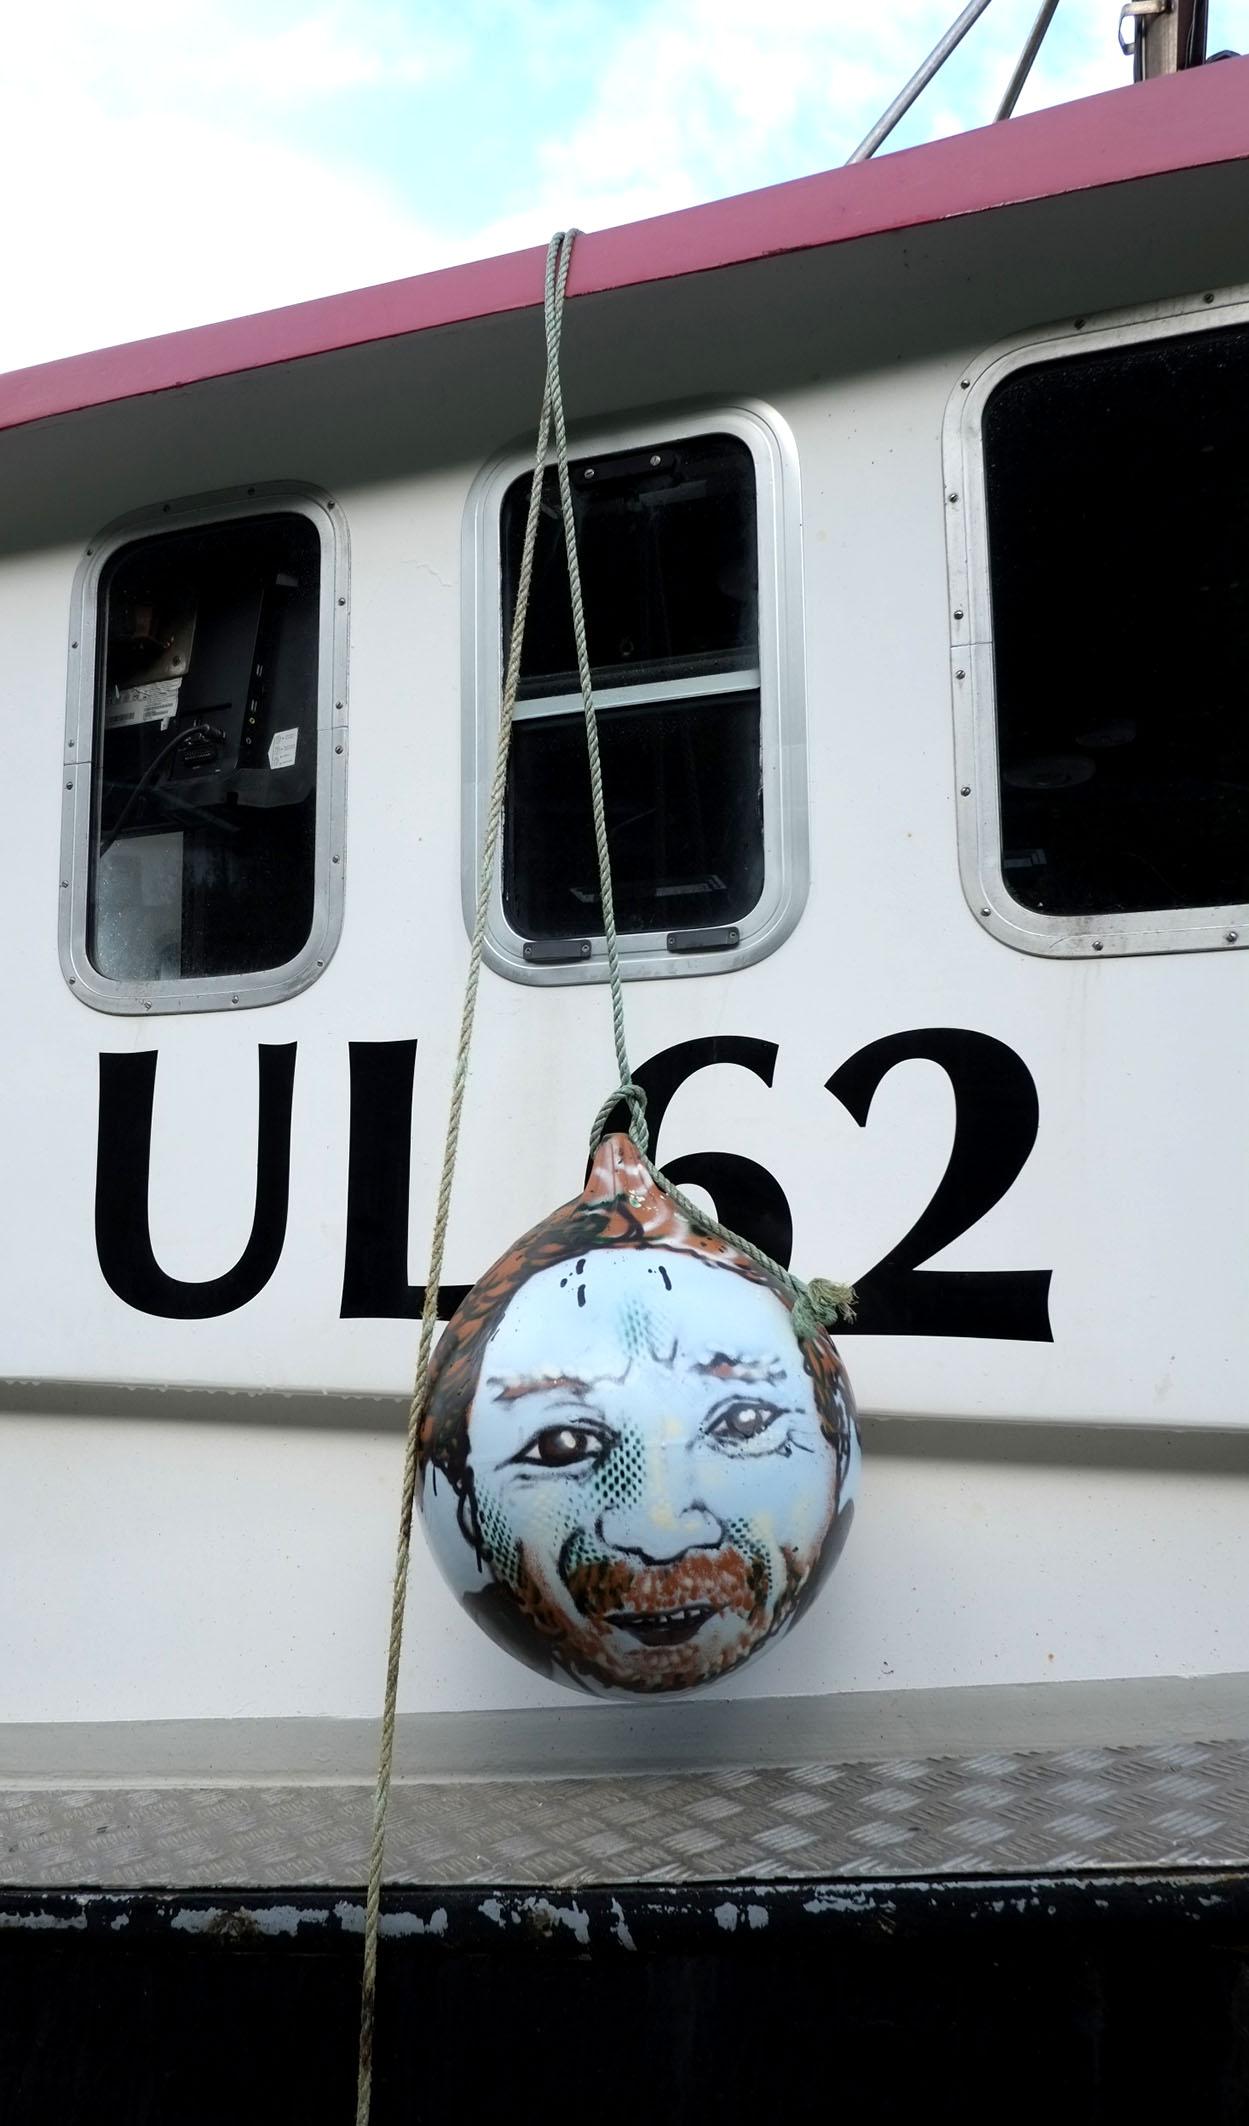 Whiten_Crinan buoy portrait artist 2.JPG